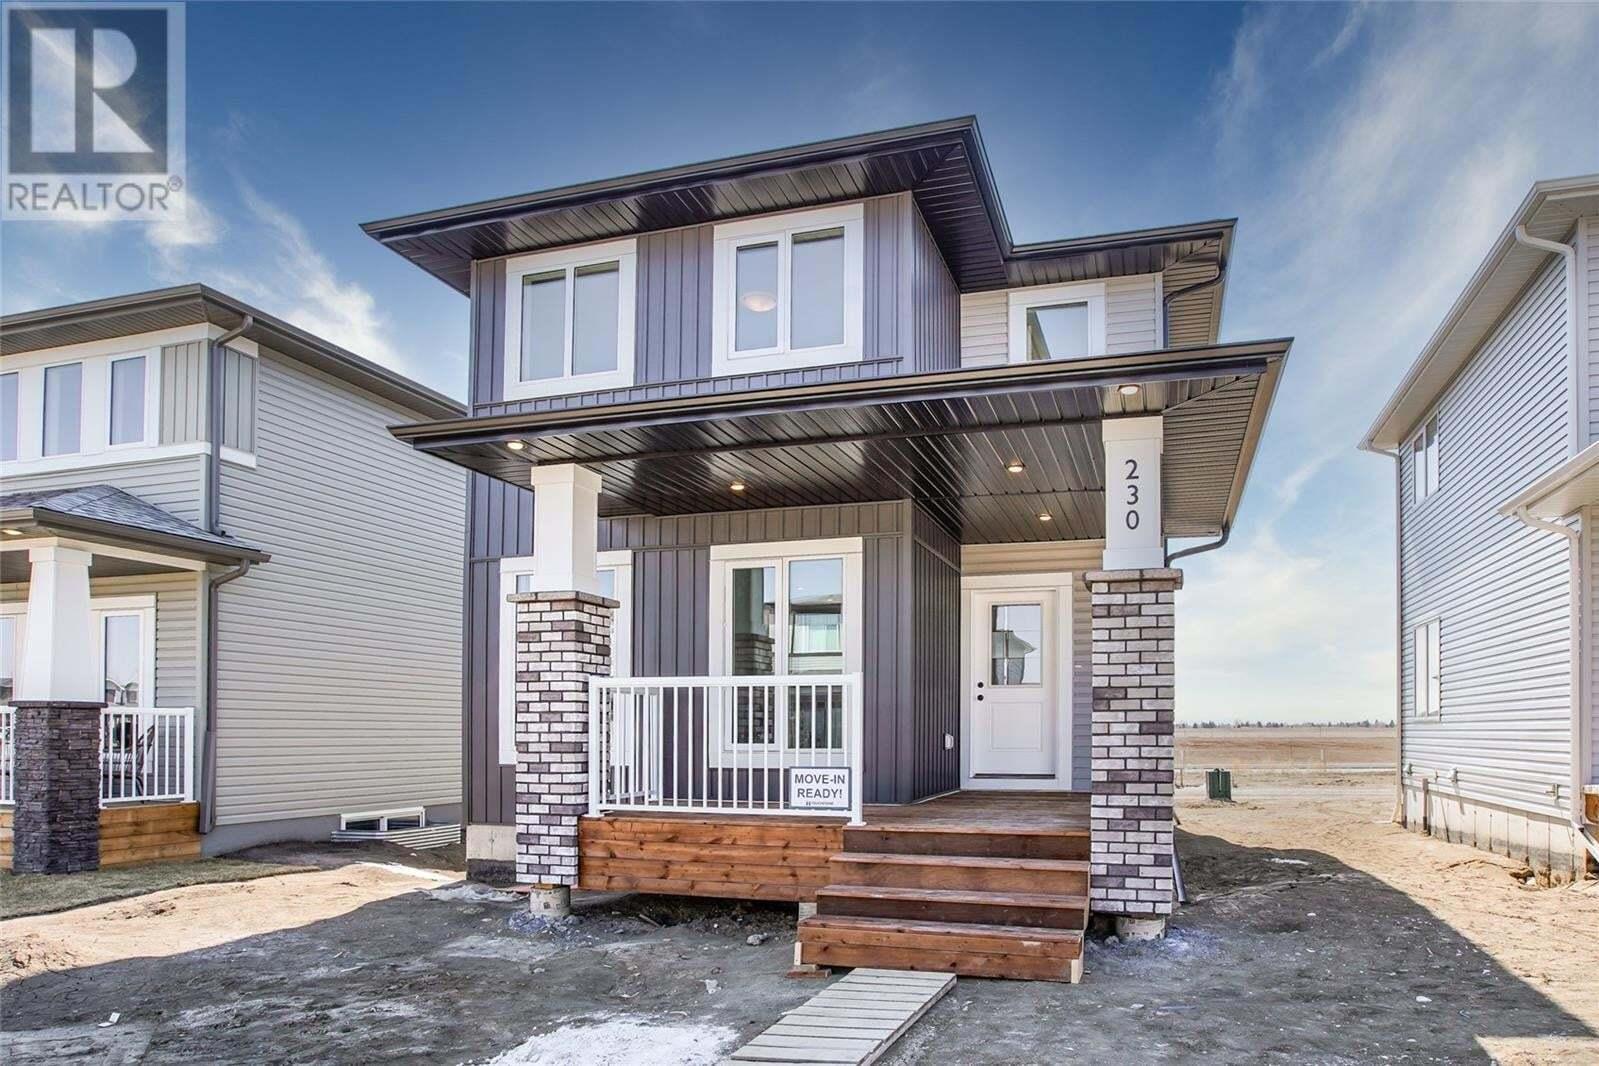 House for sale at 230 Dubois Cres Saskatoon Saskatchewan - MLS: SK824019